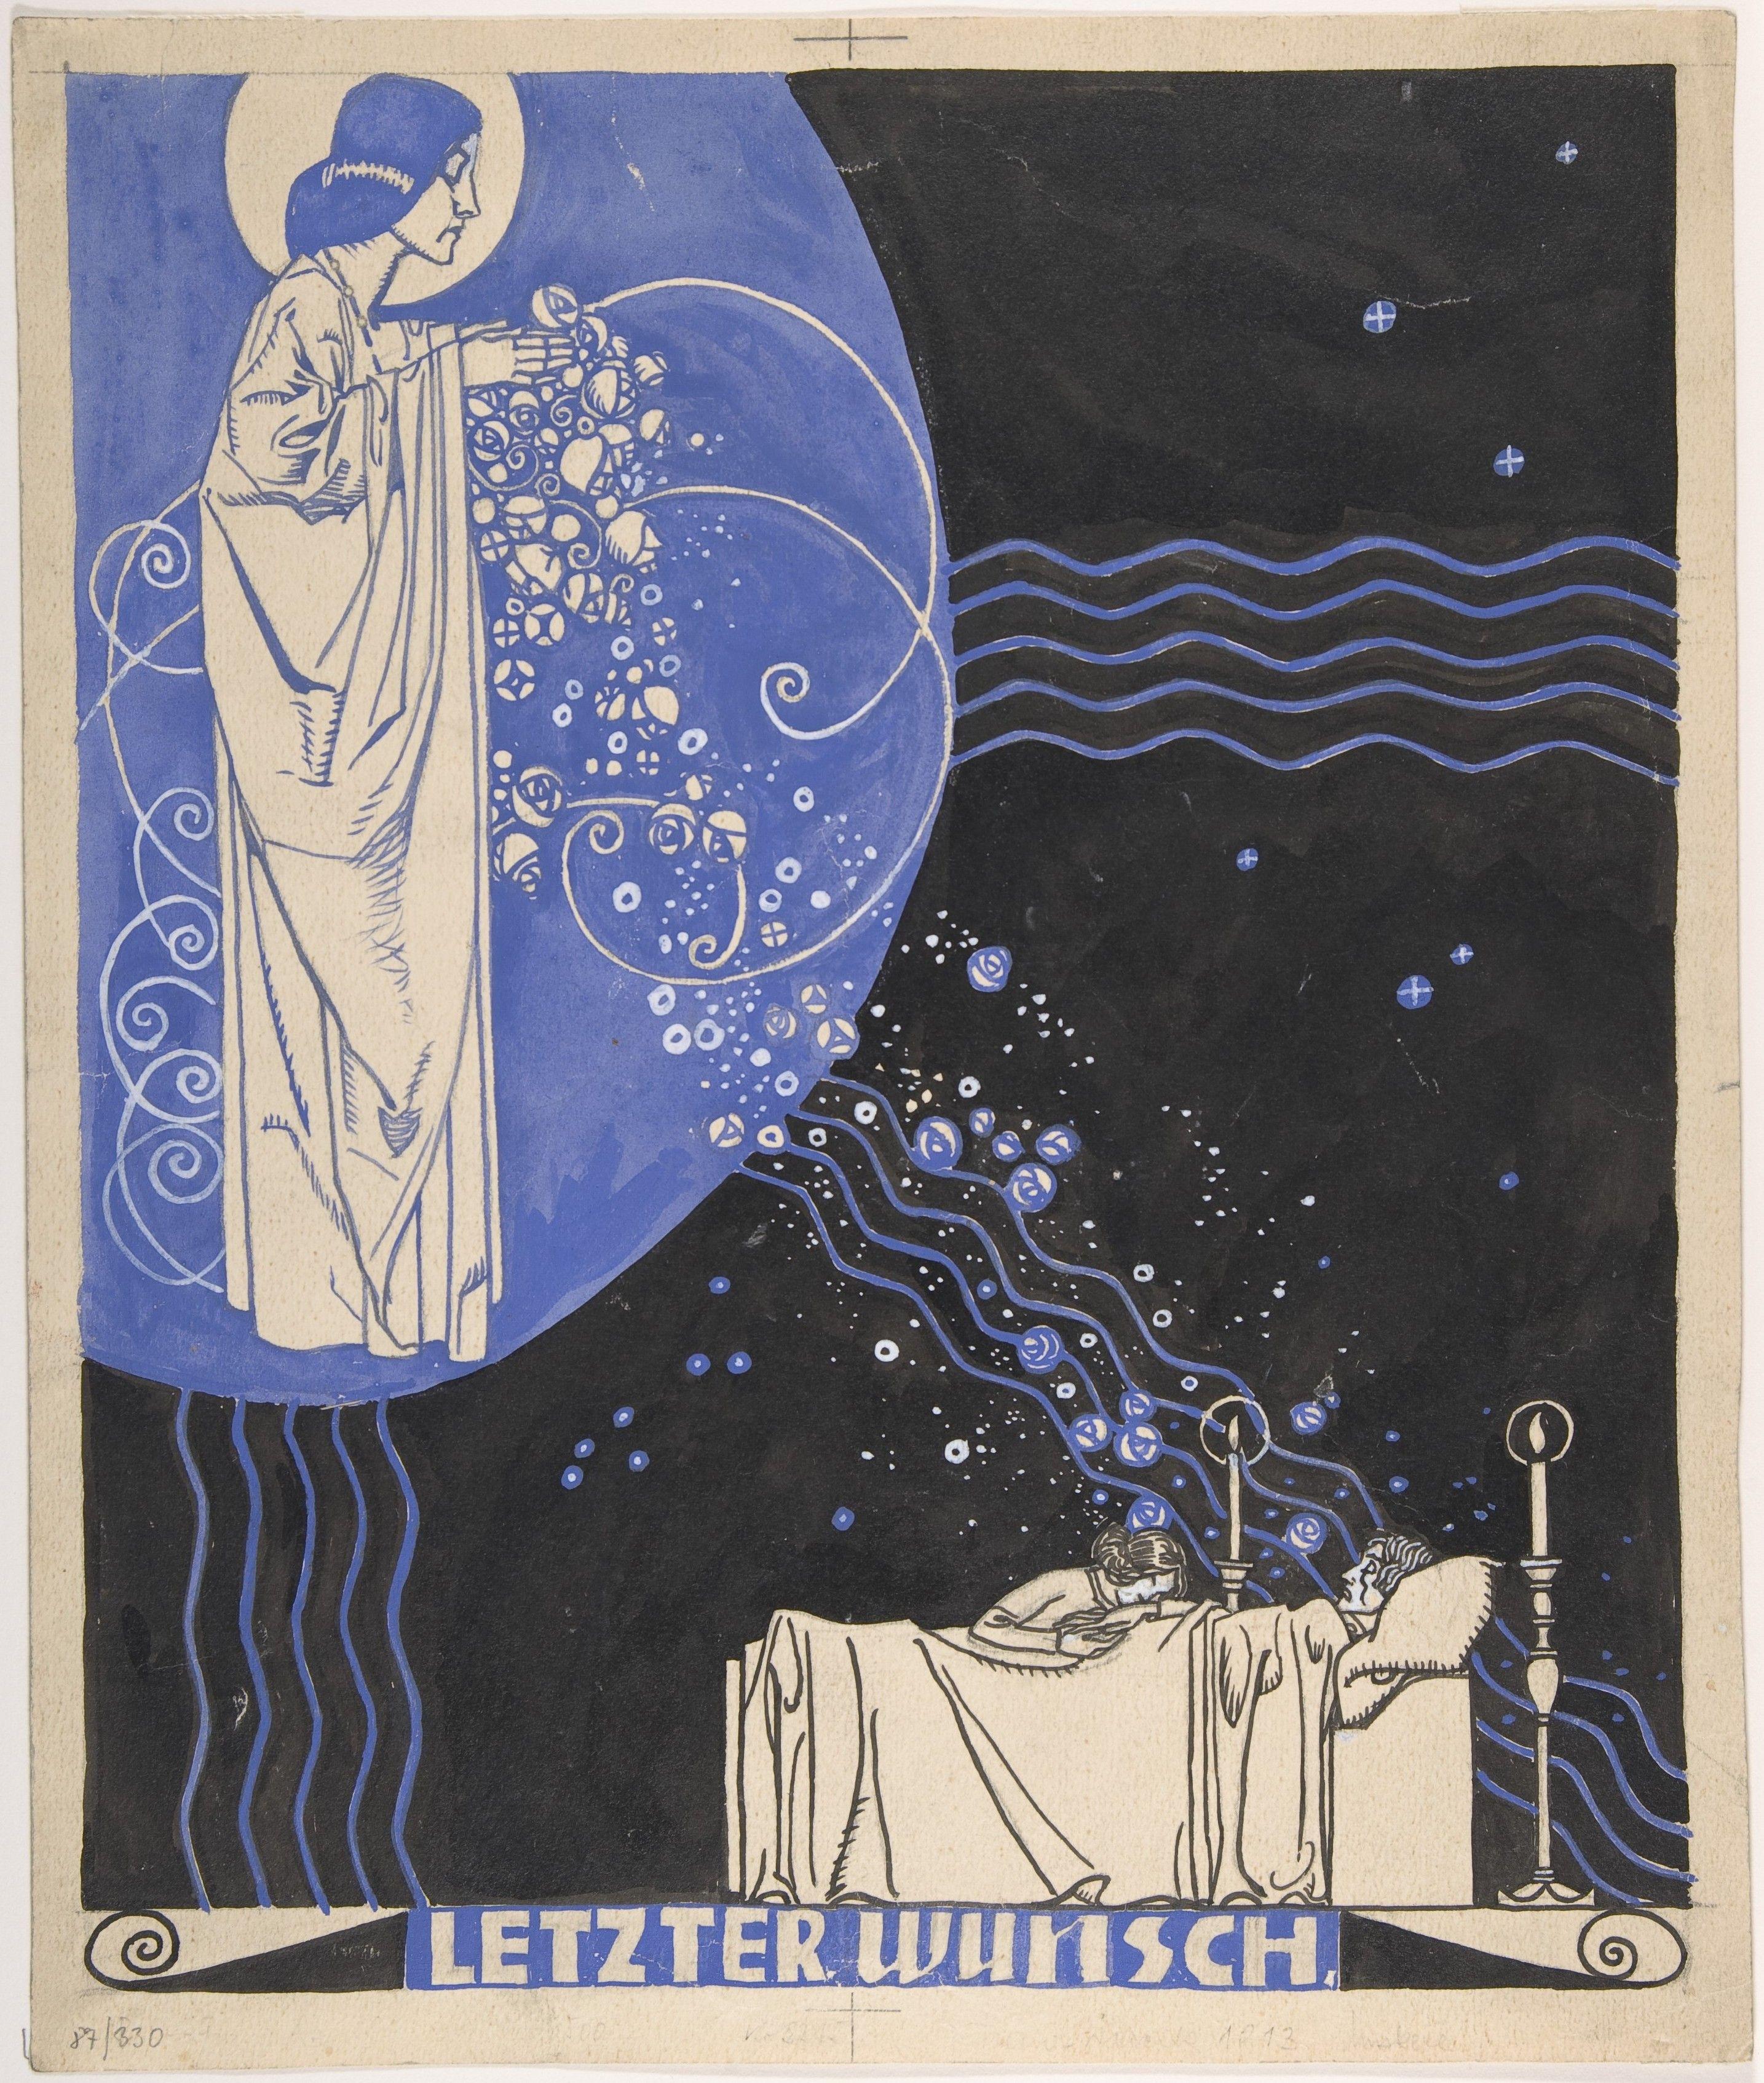 Franz Wacik (1883-1938), Letzter Wunsh, early 20th century.